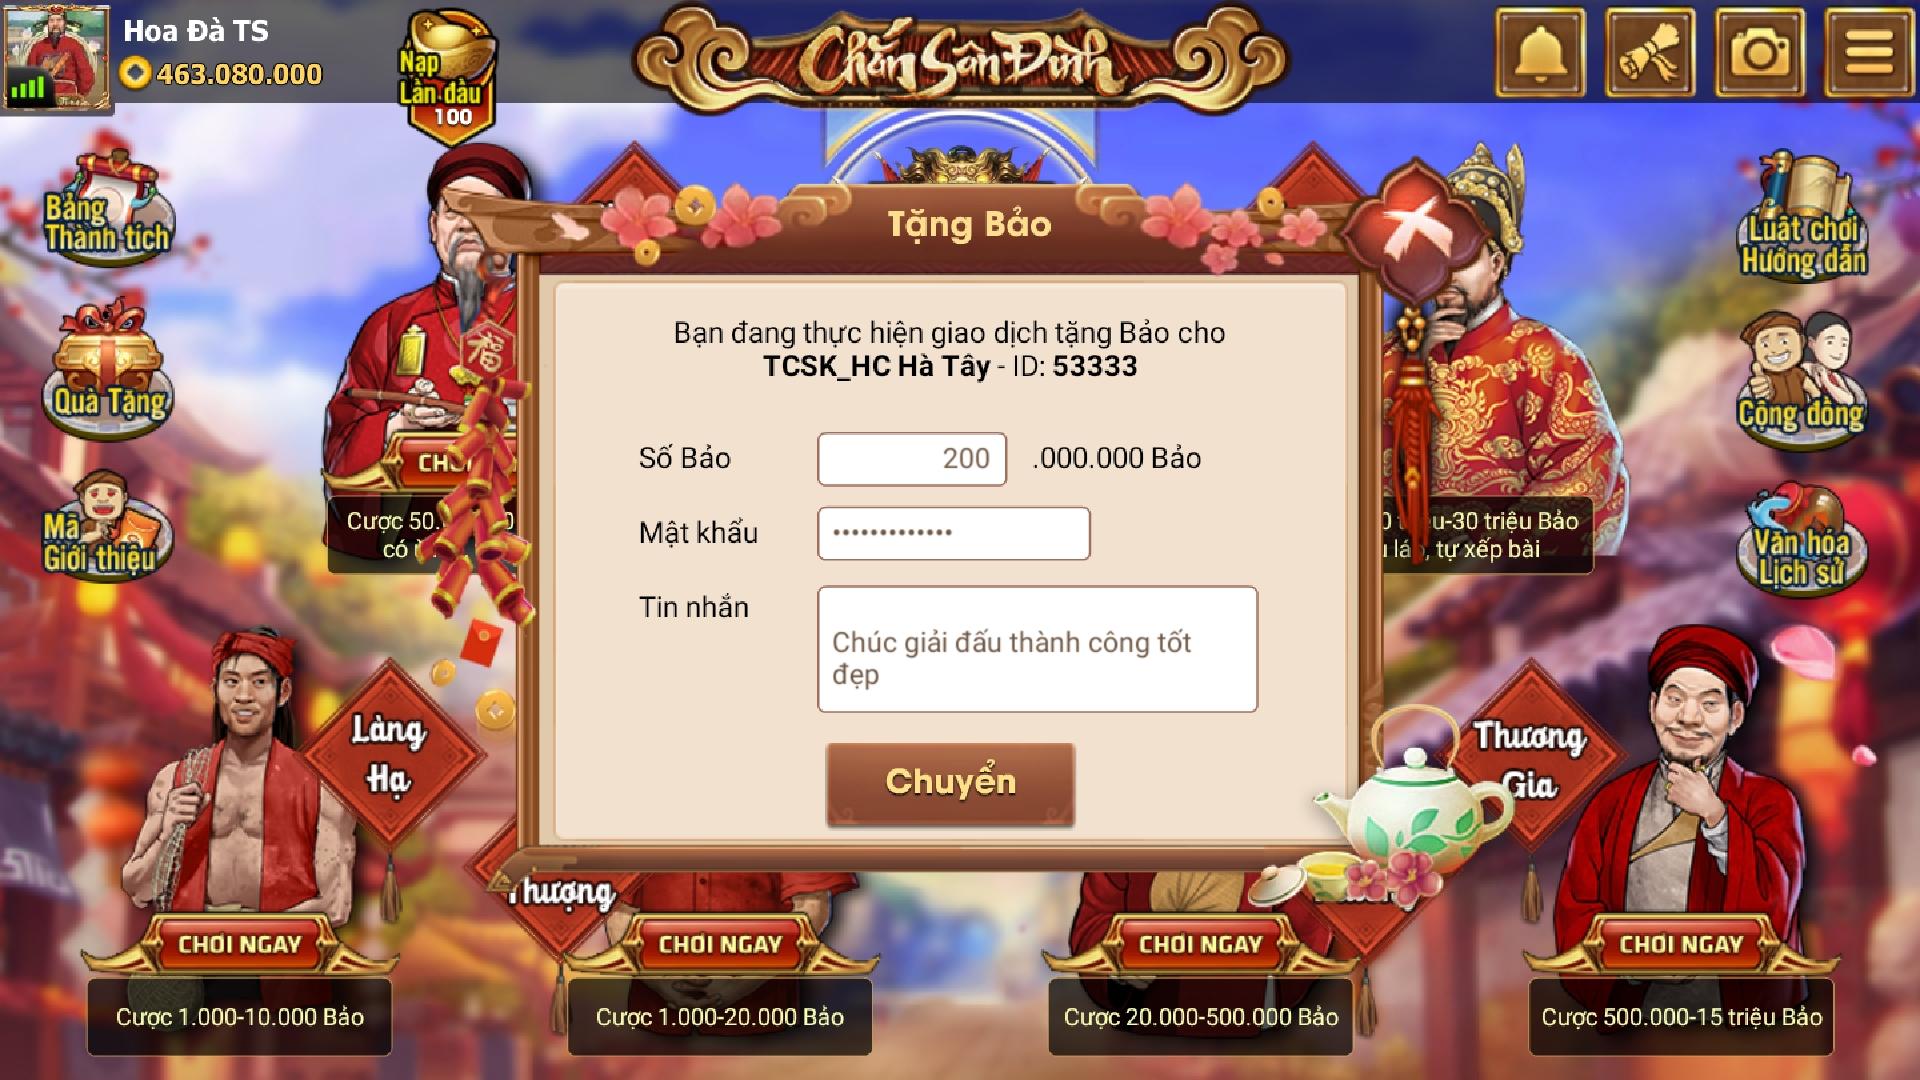 Screenshot_20210426-164118_Chn Sn nh.